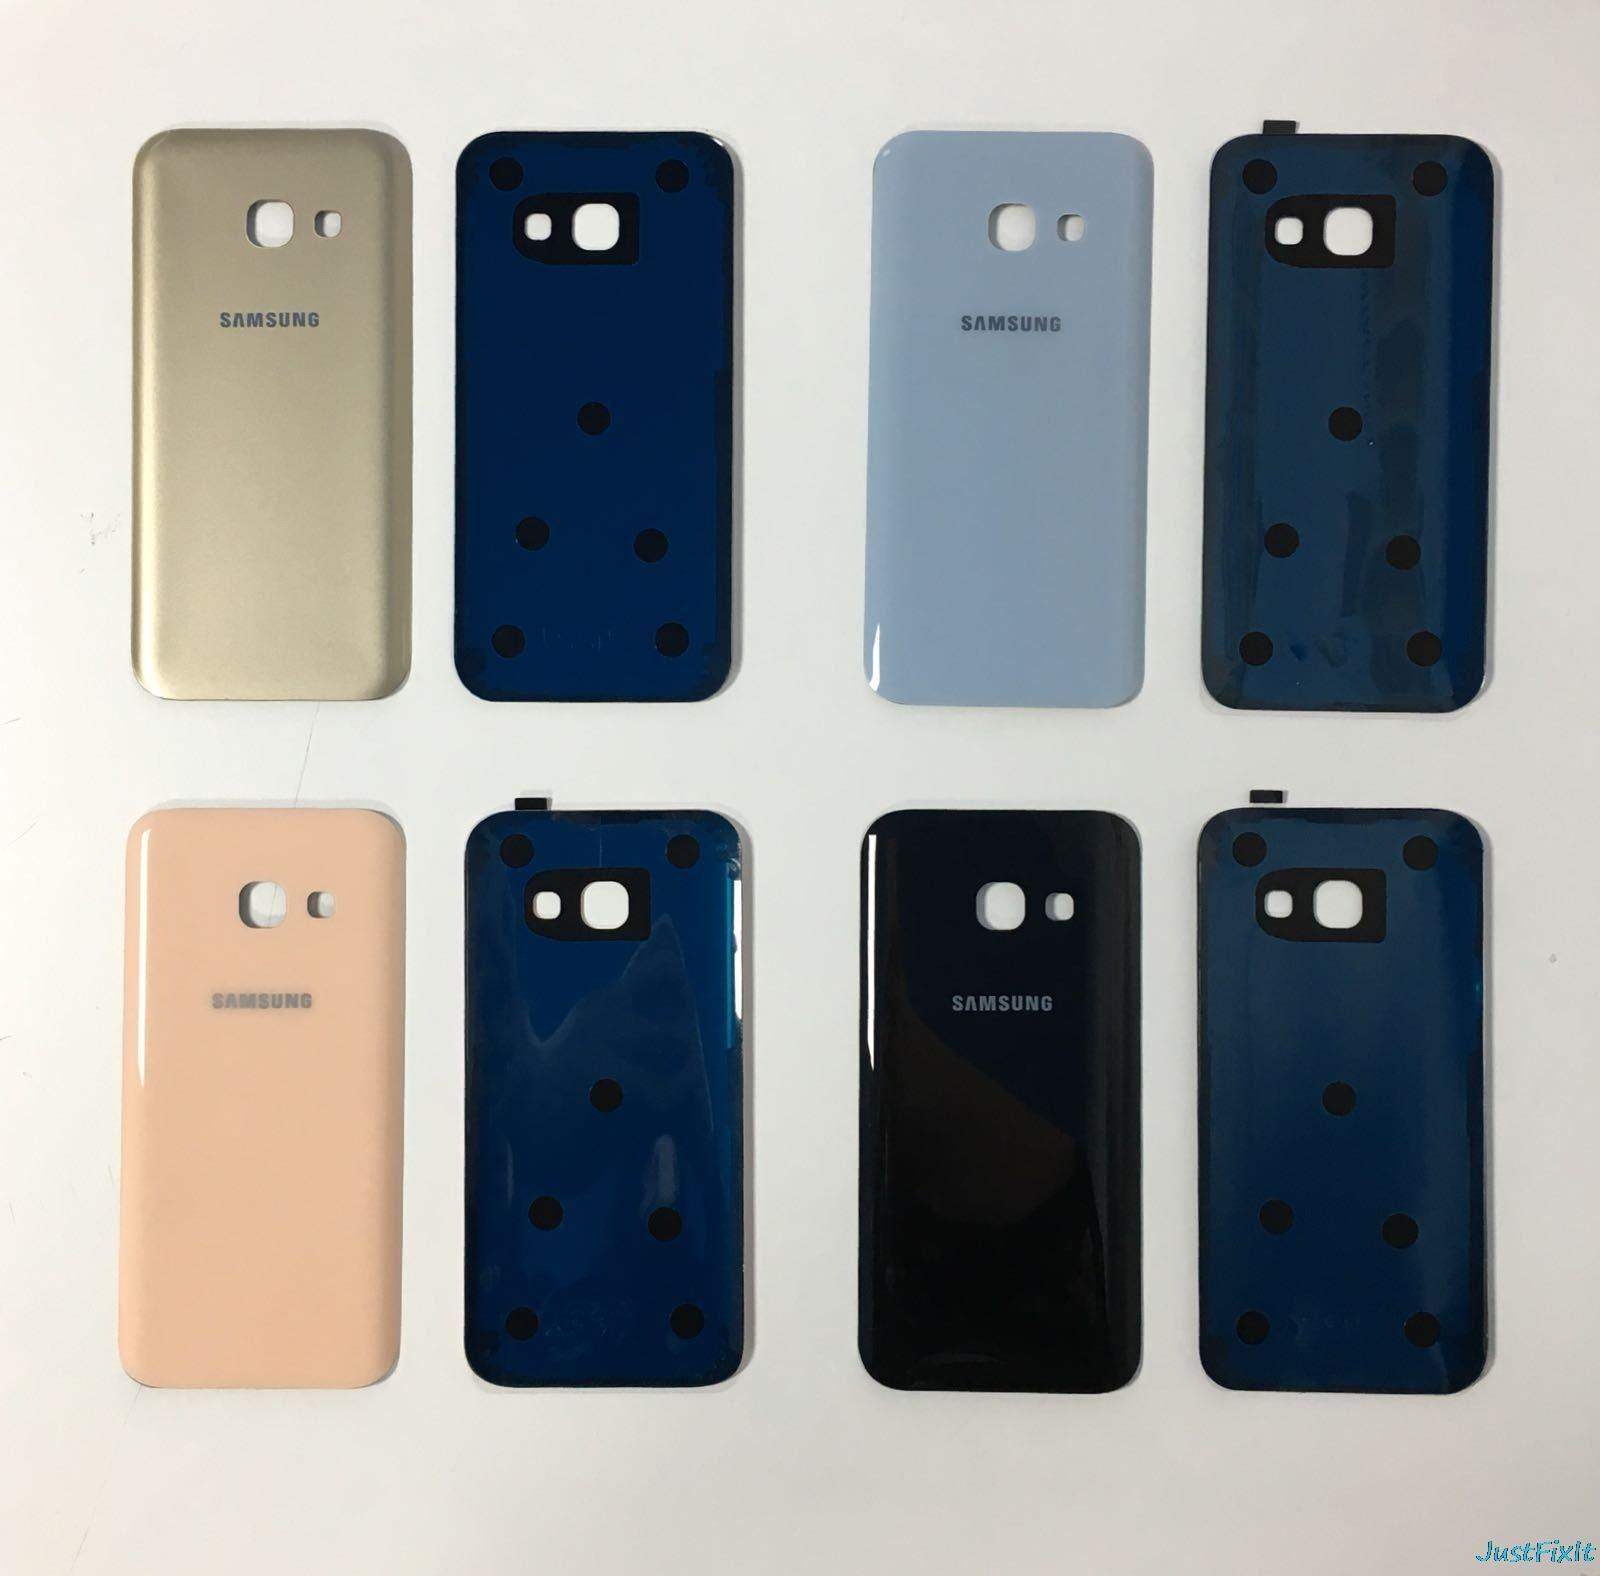 samsung galaxy a3 charging case